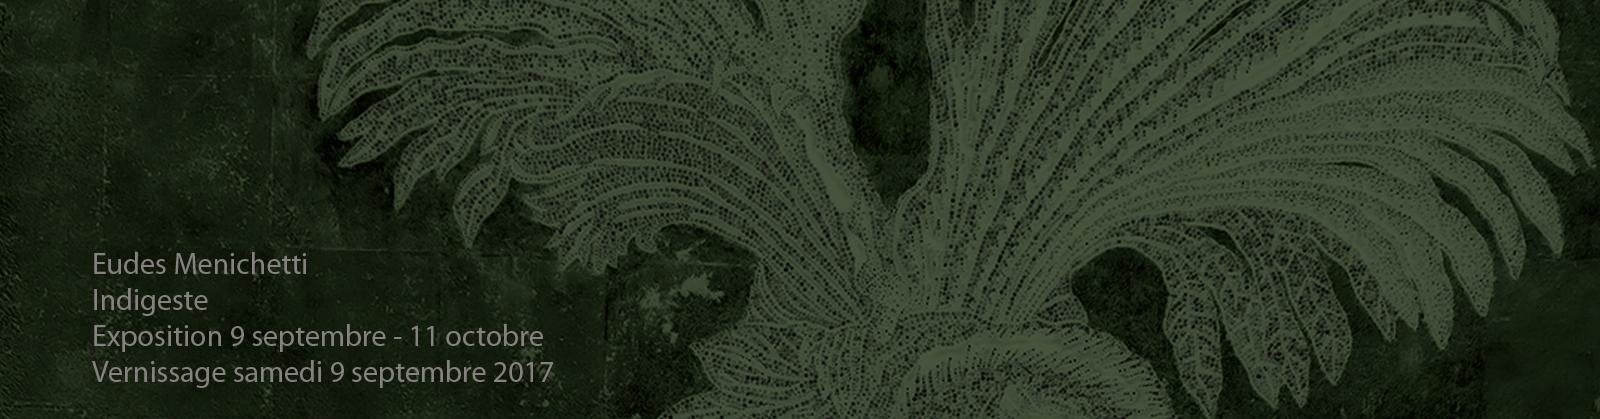 Eudes Menichetti – Indigeste – Galerie Eko Sato – Detail —